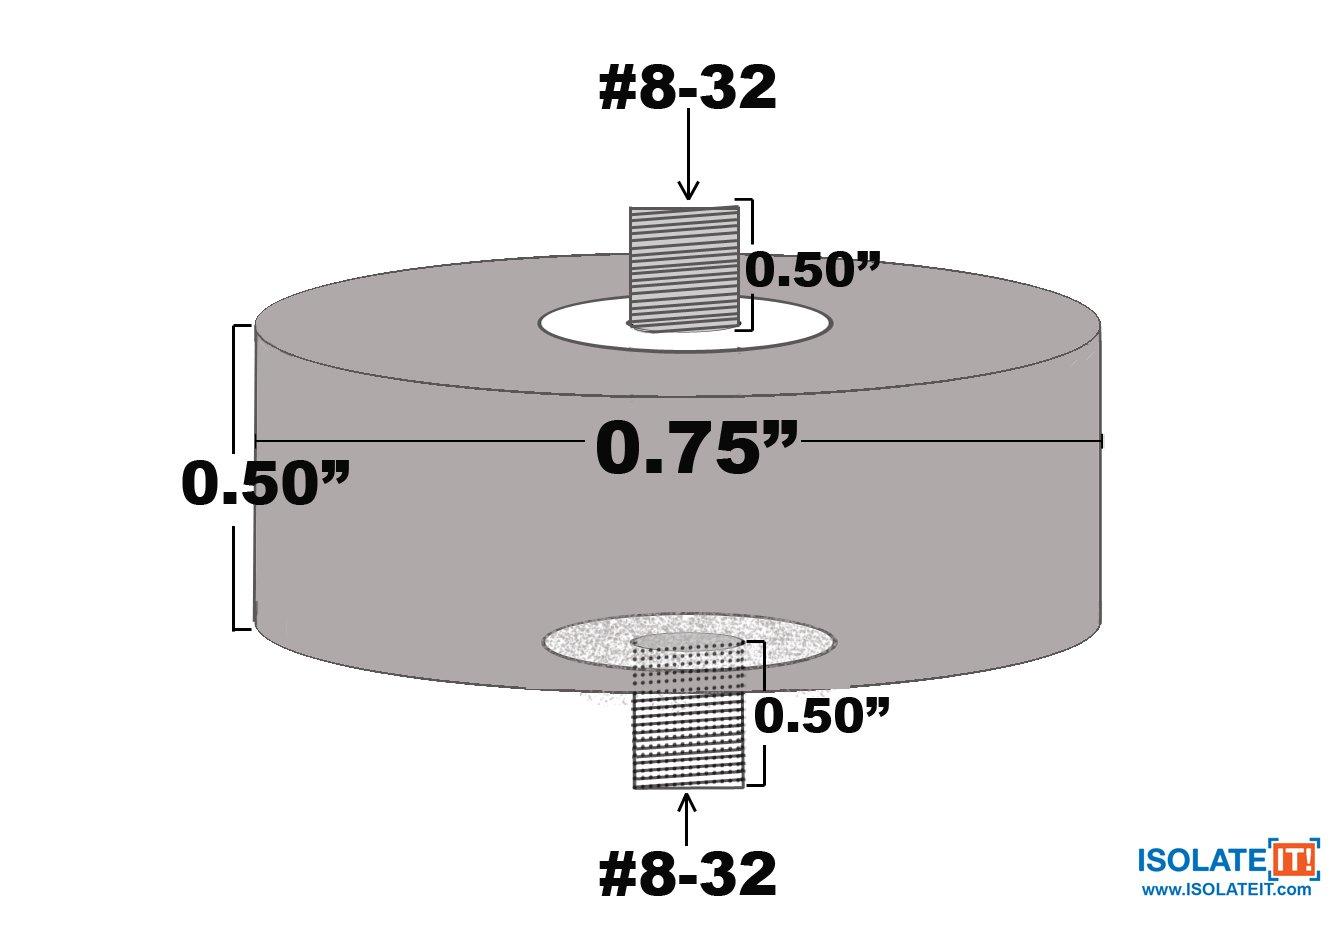 Isolate It!: Sorbothane Male/male Vibration Stud Mount - #8-32 - 1/2'' (H) - 3/4'' (Dia) 50 Duro - Set of 4